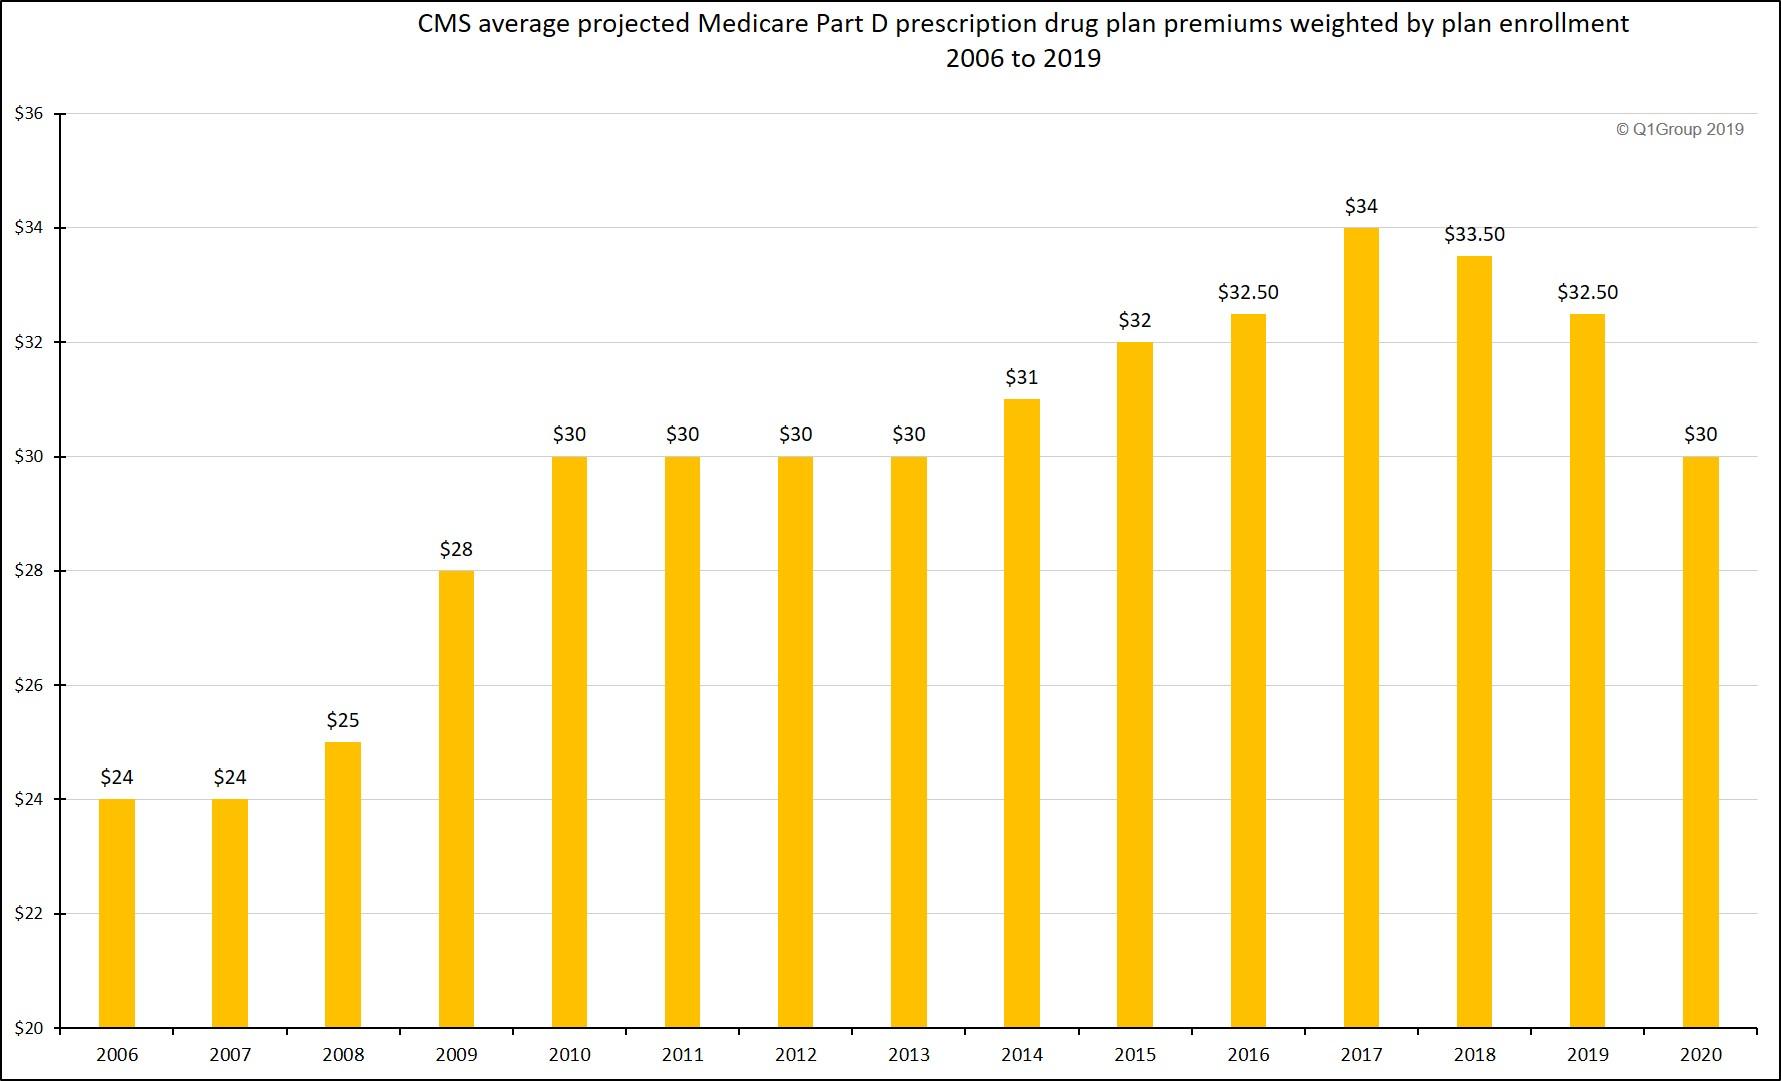 Changes in project Medicare Part D premiums